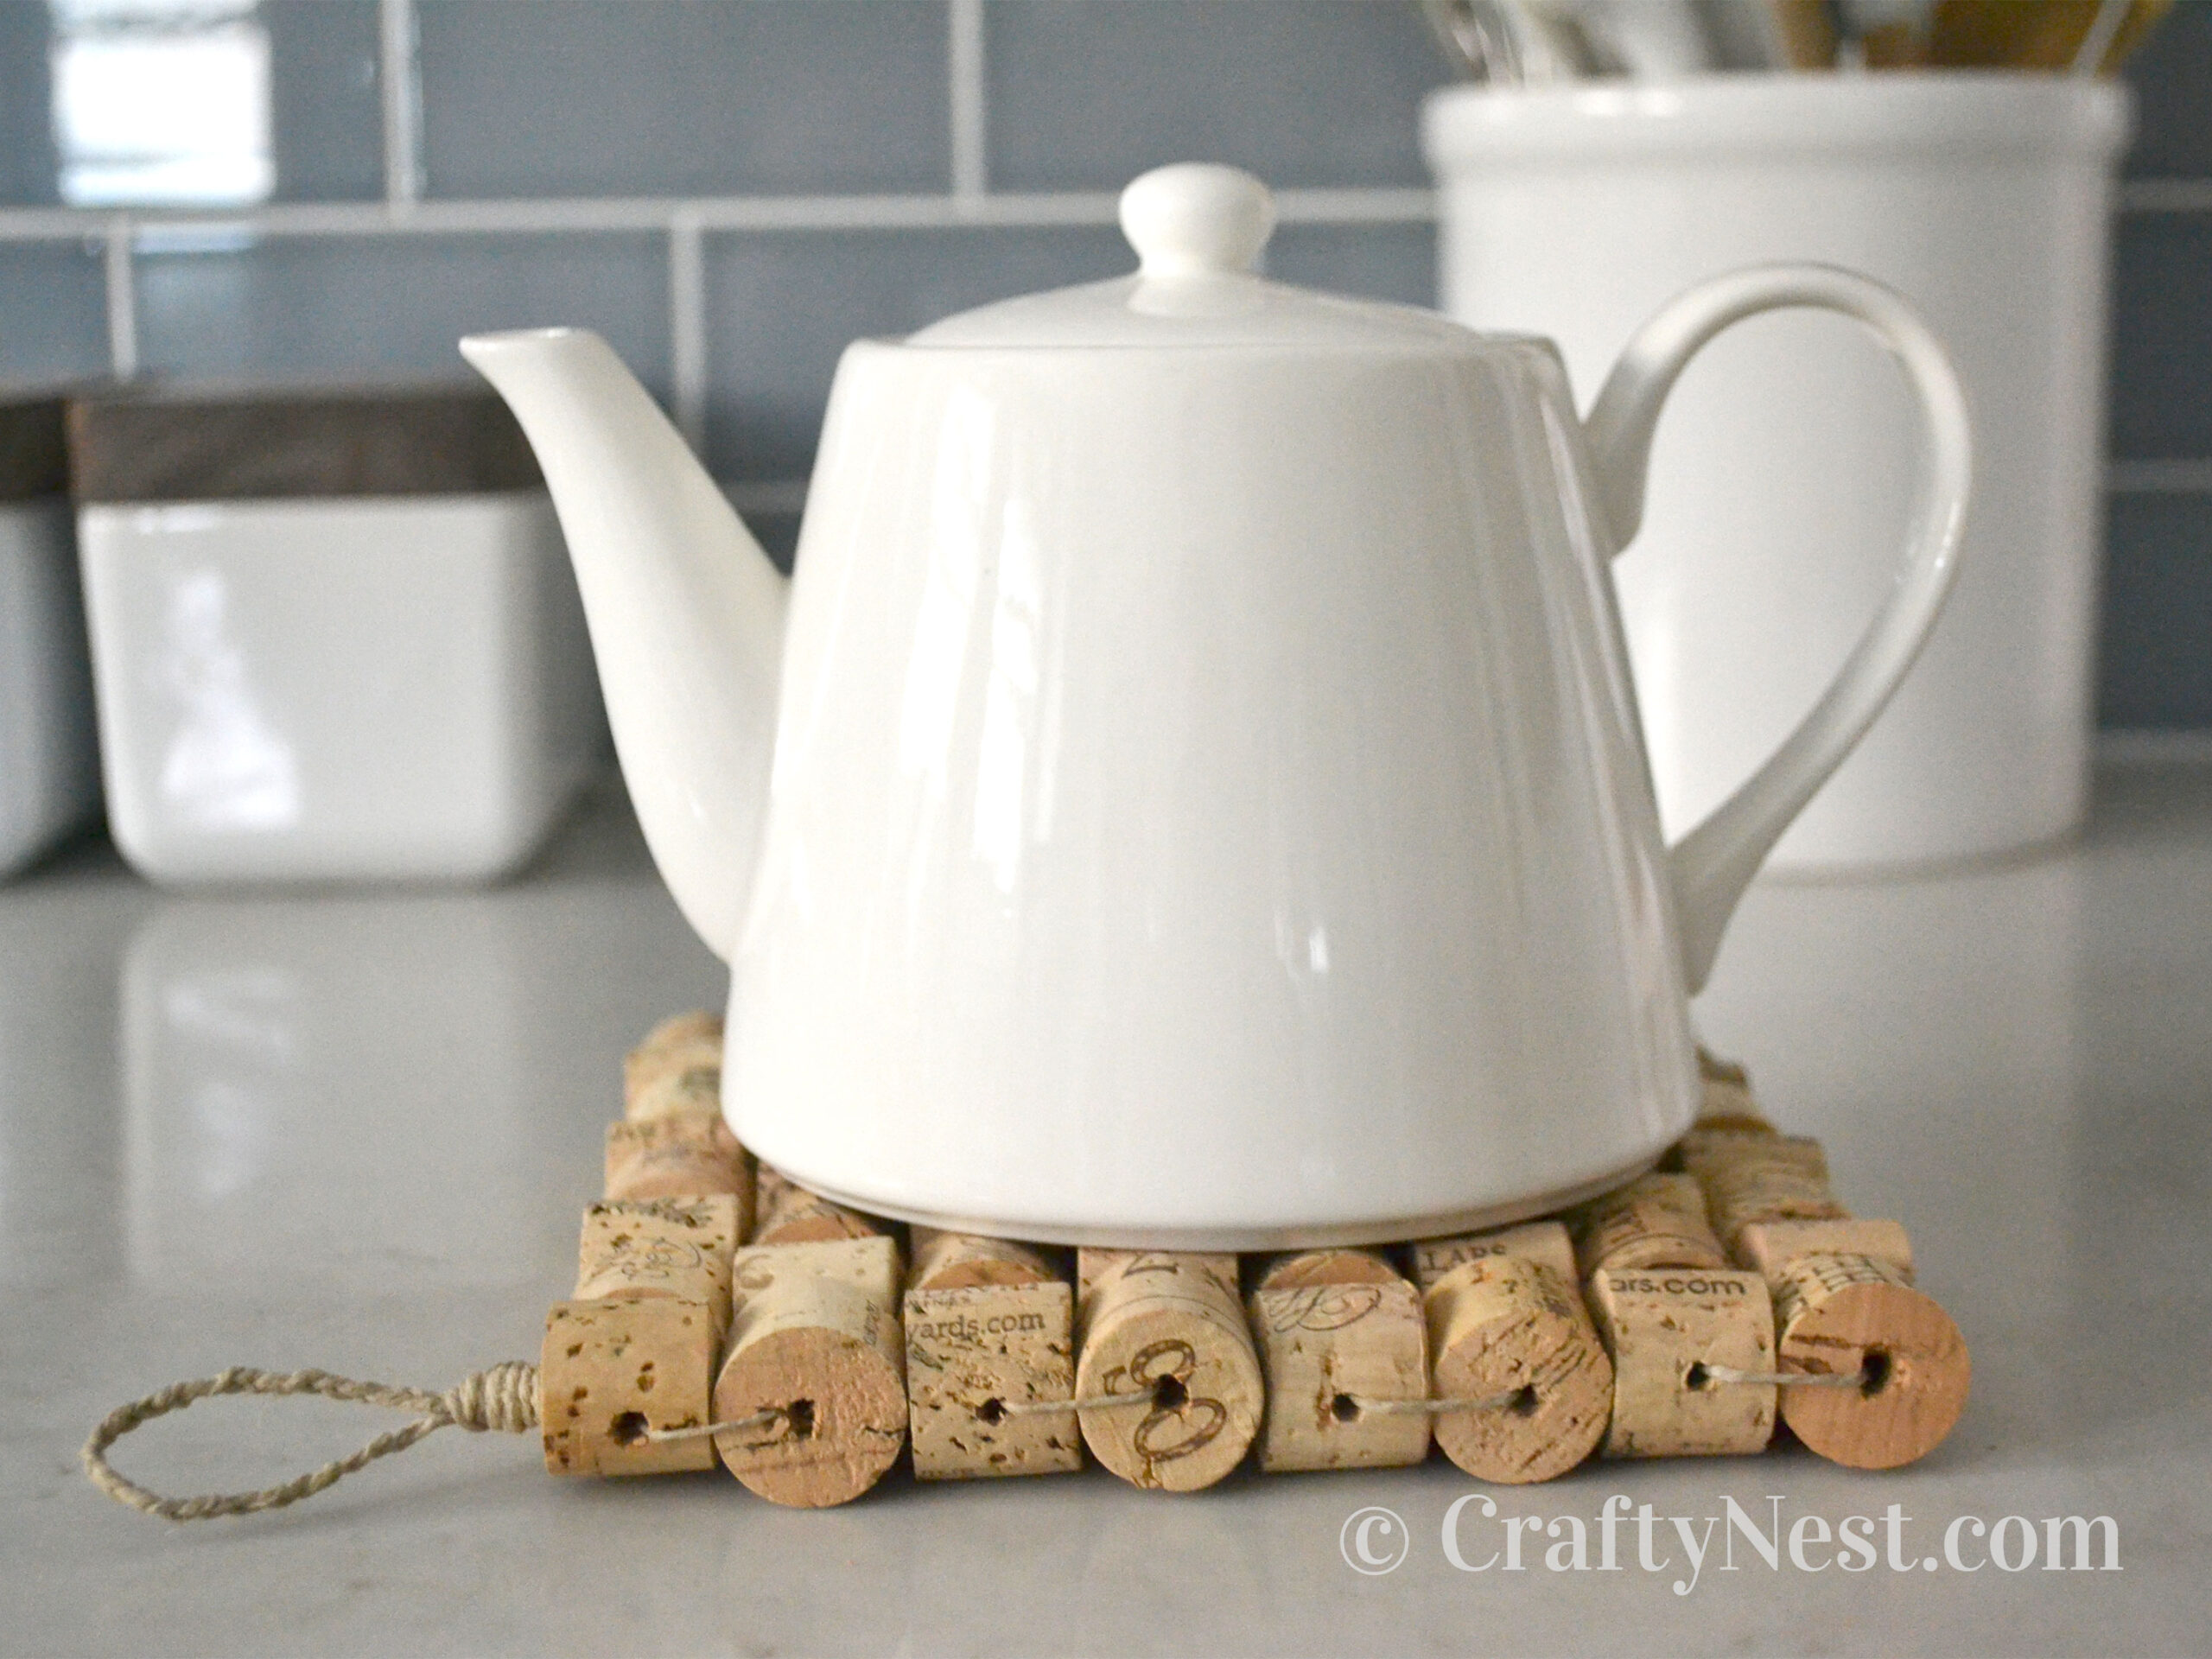 Teapot on a wine-cork trivet, photo